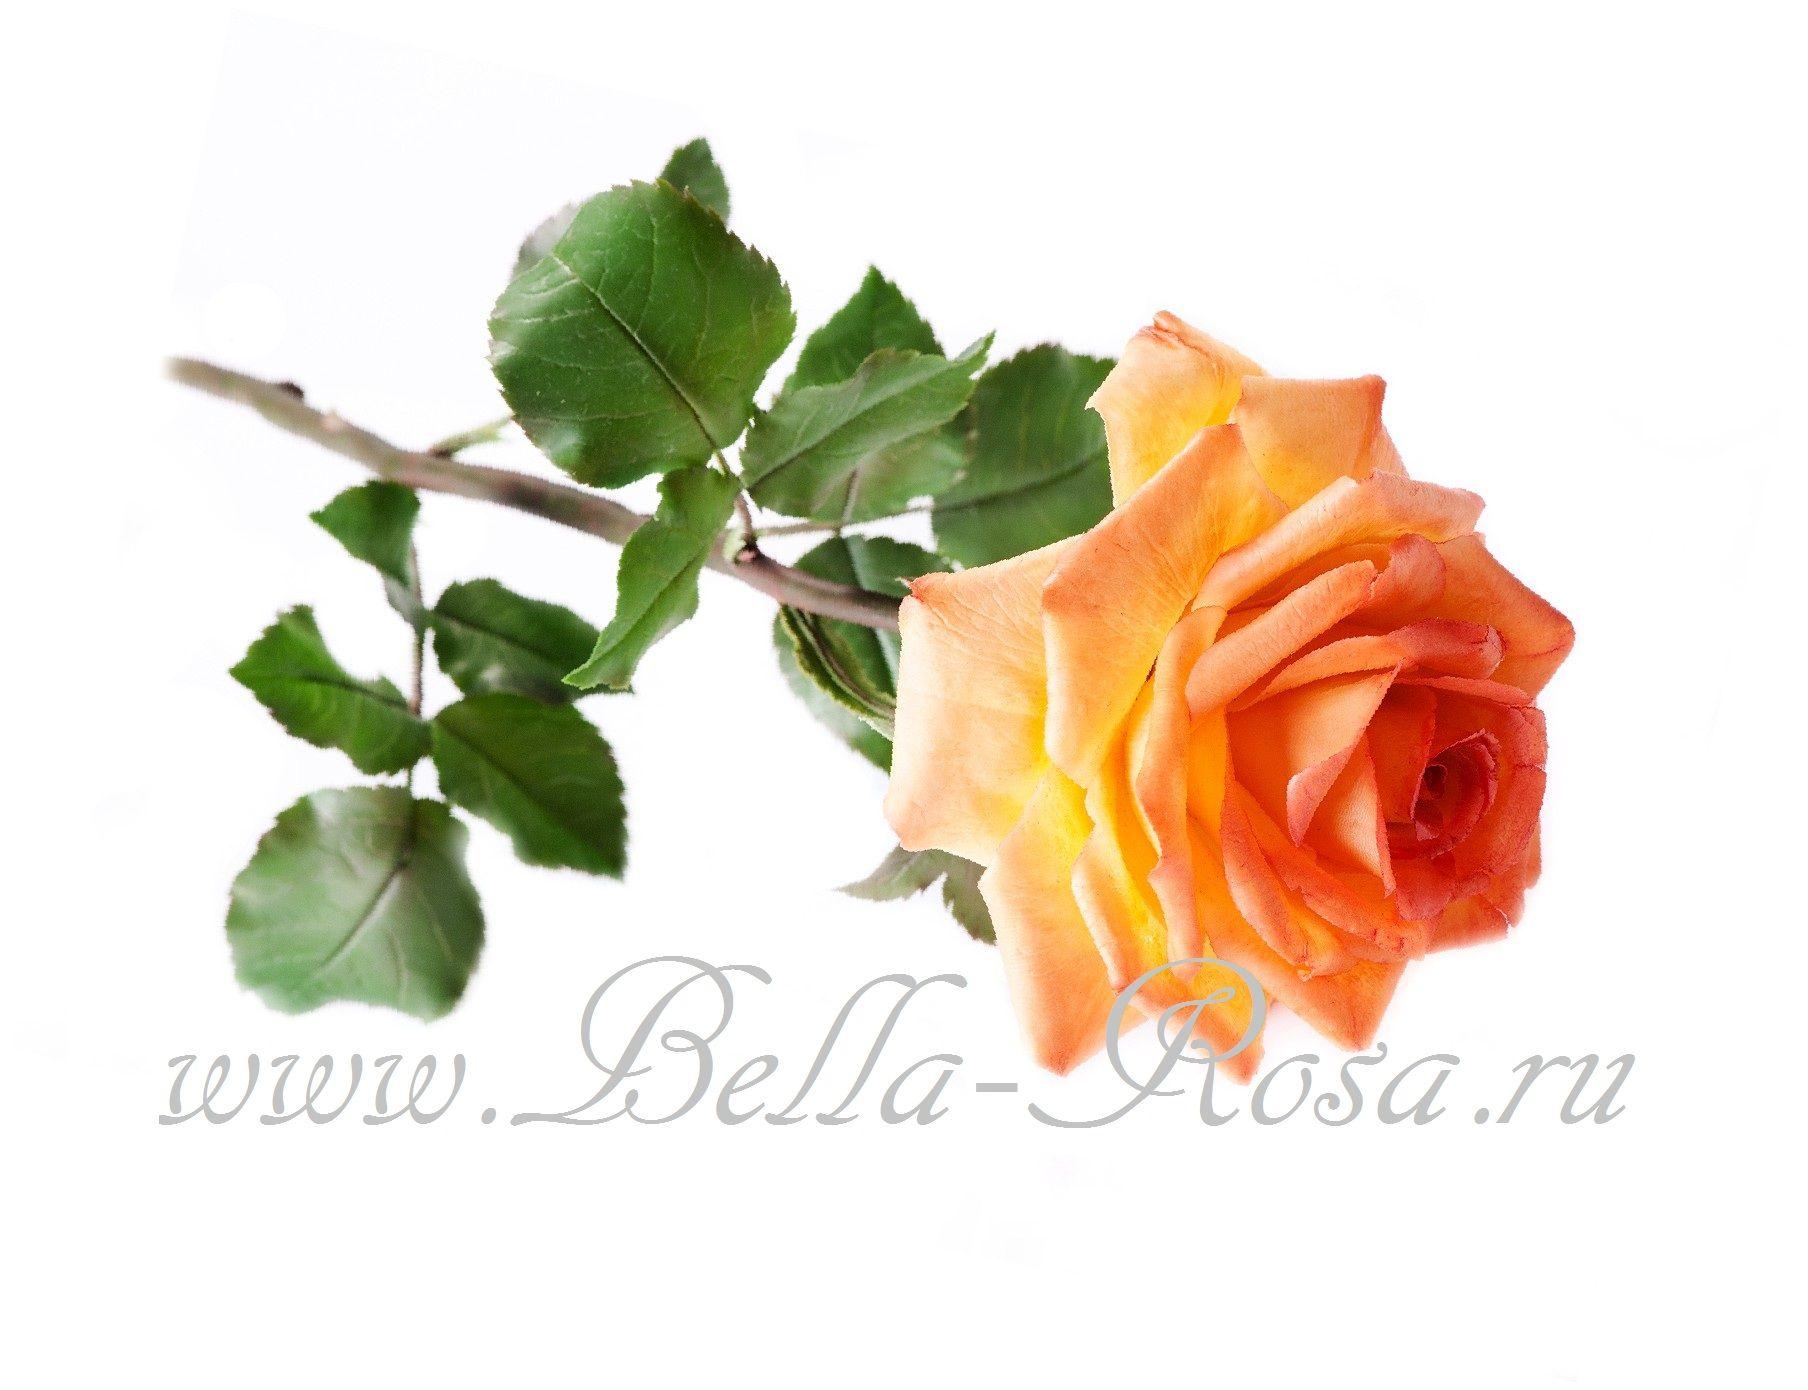 Белла роза керамическая флористика